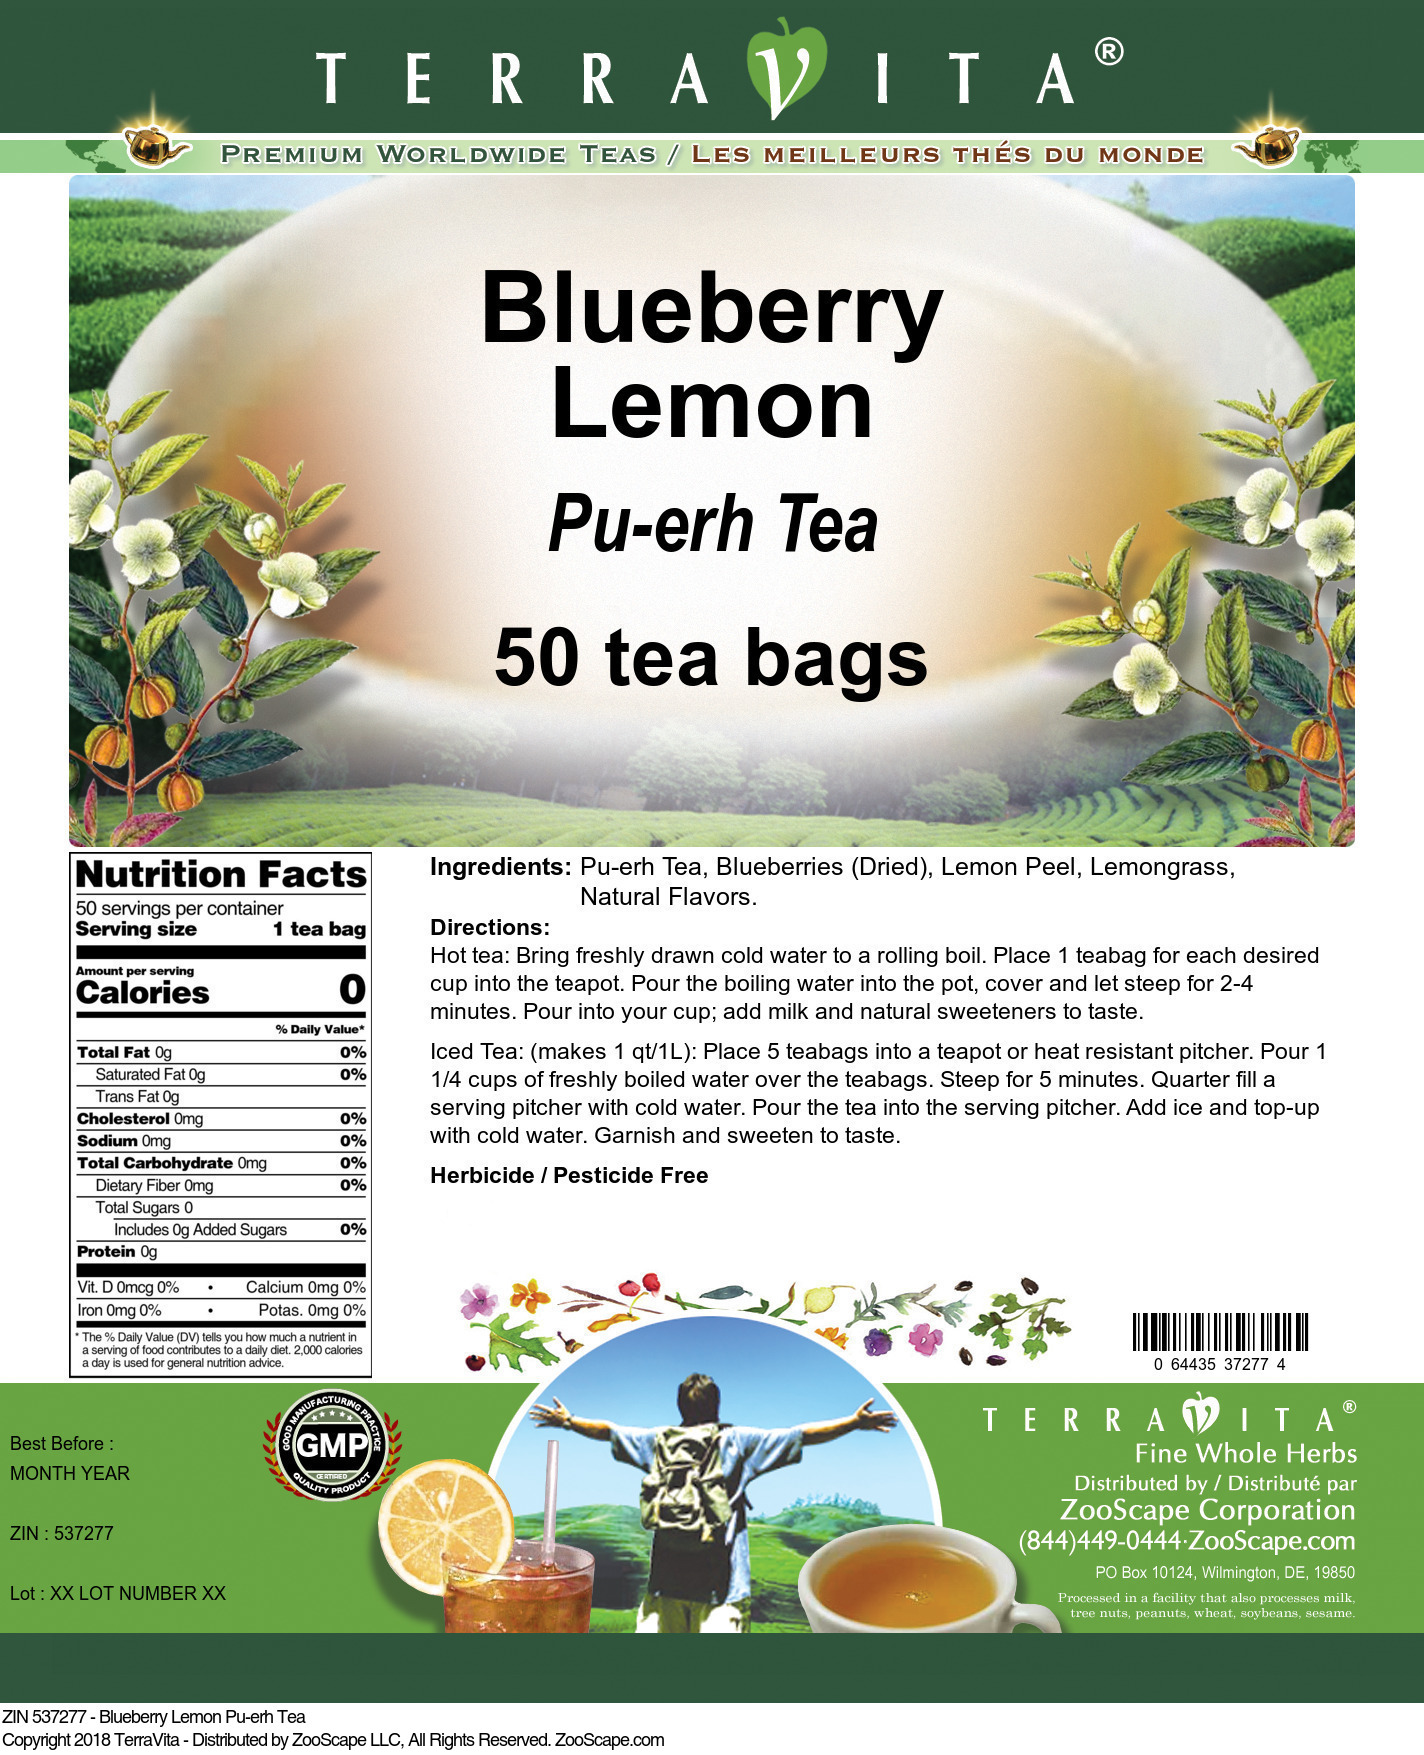 Blueberry Lemon Pu-erh Tea